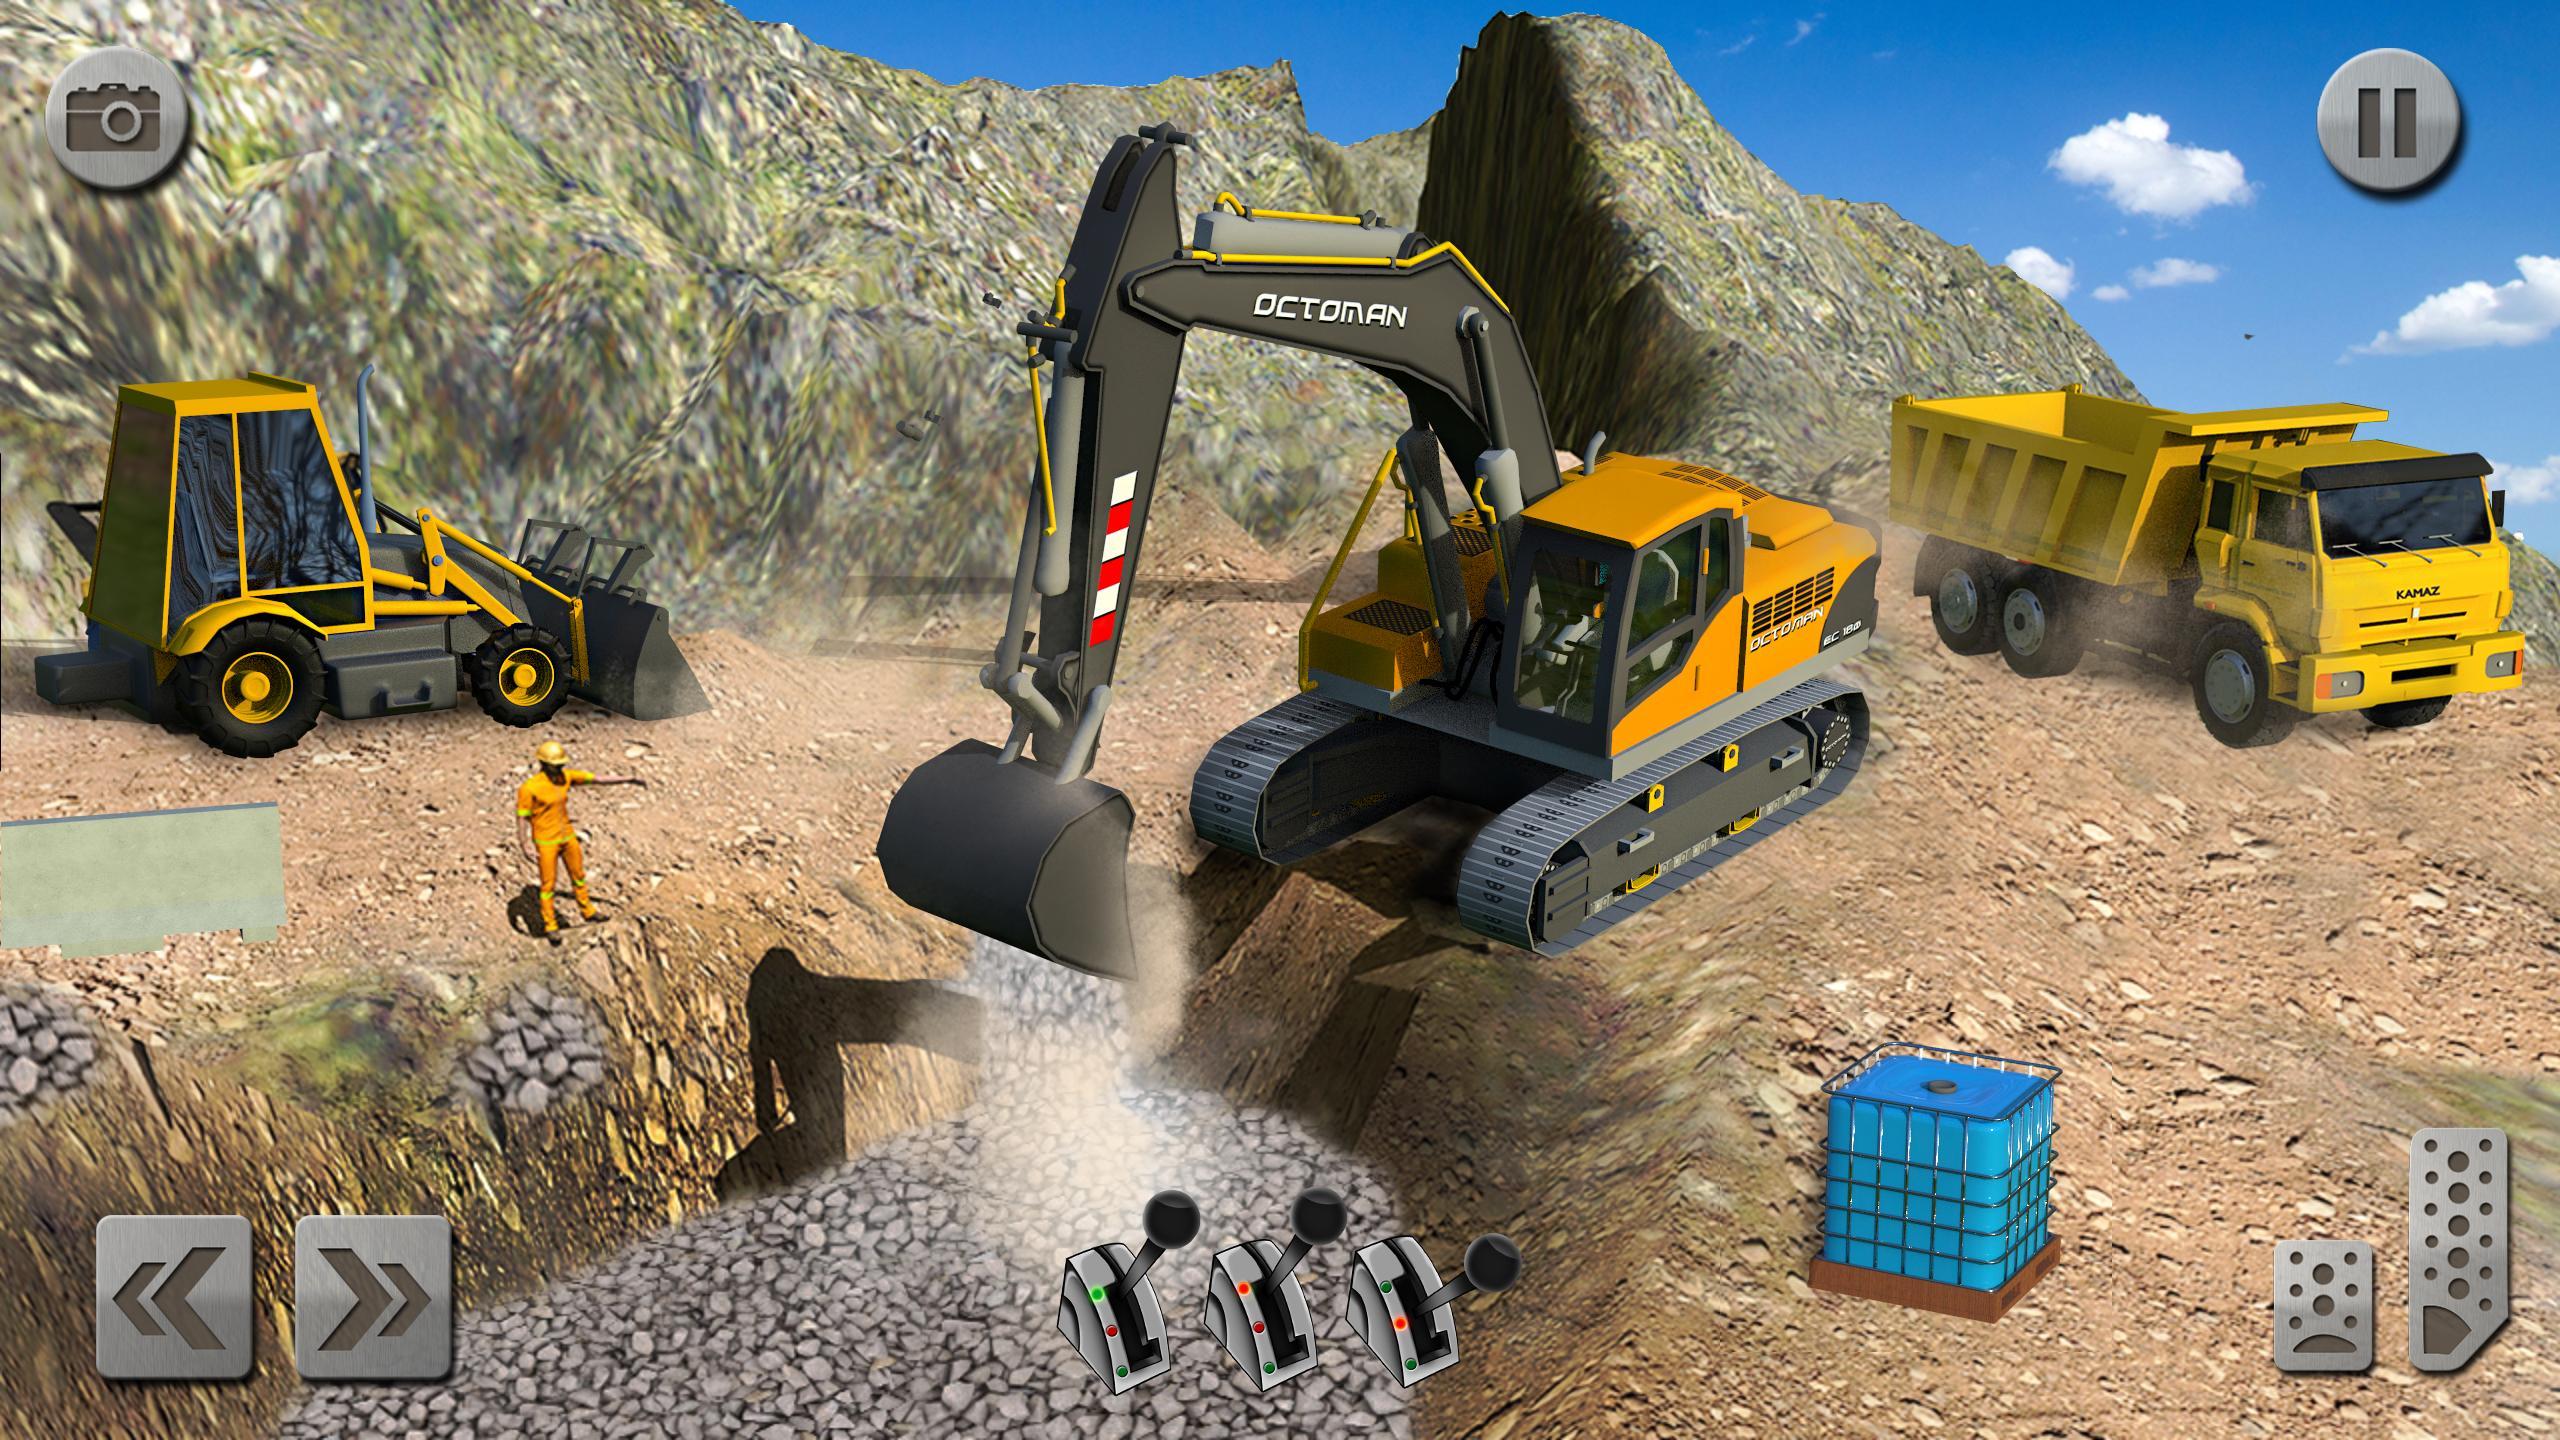 Sand Excavator Truck Driving Rescue Simulator game 5.2 Screenshot 11